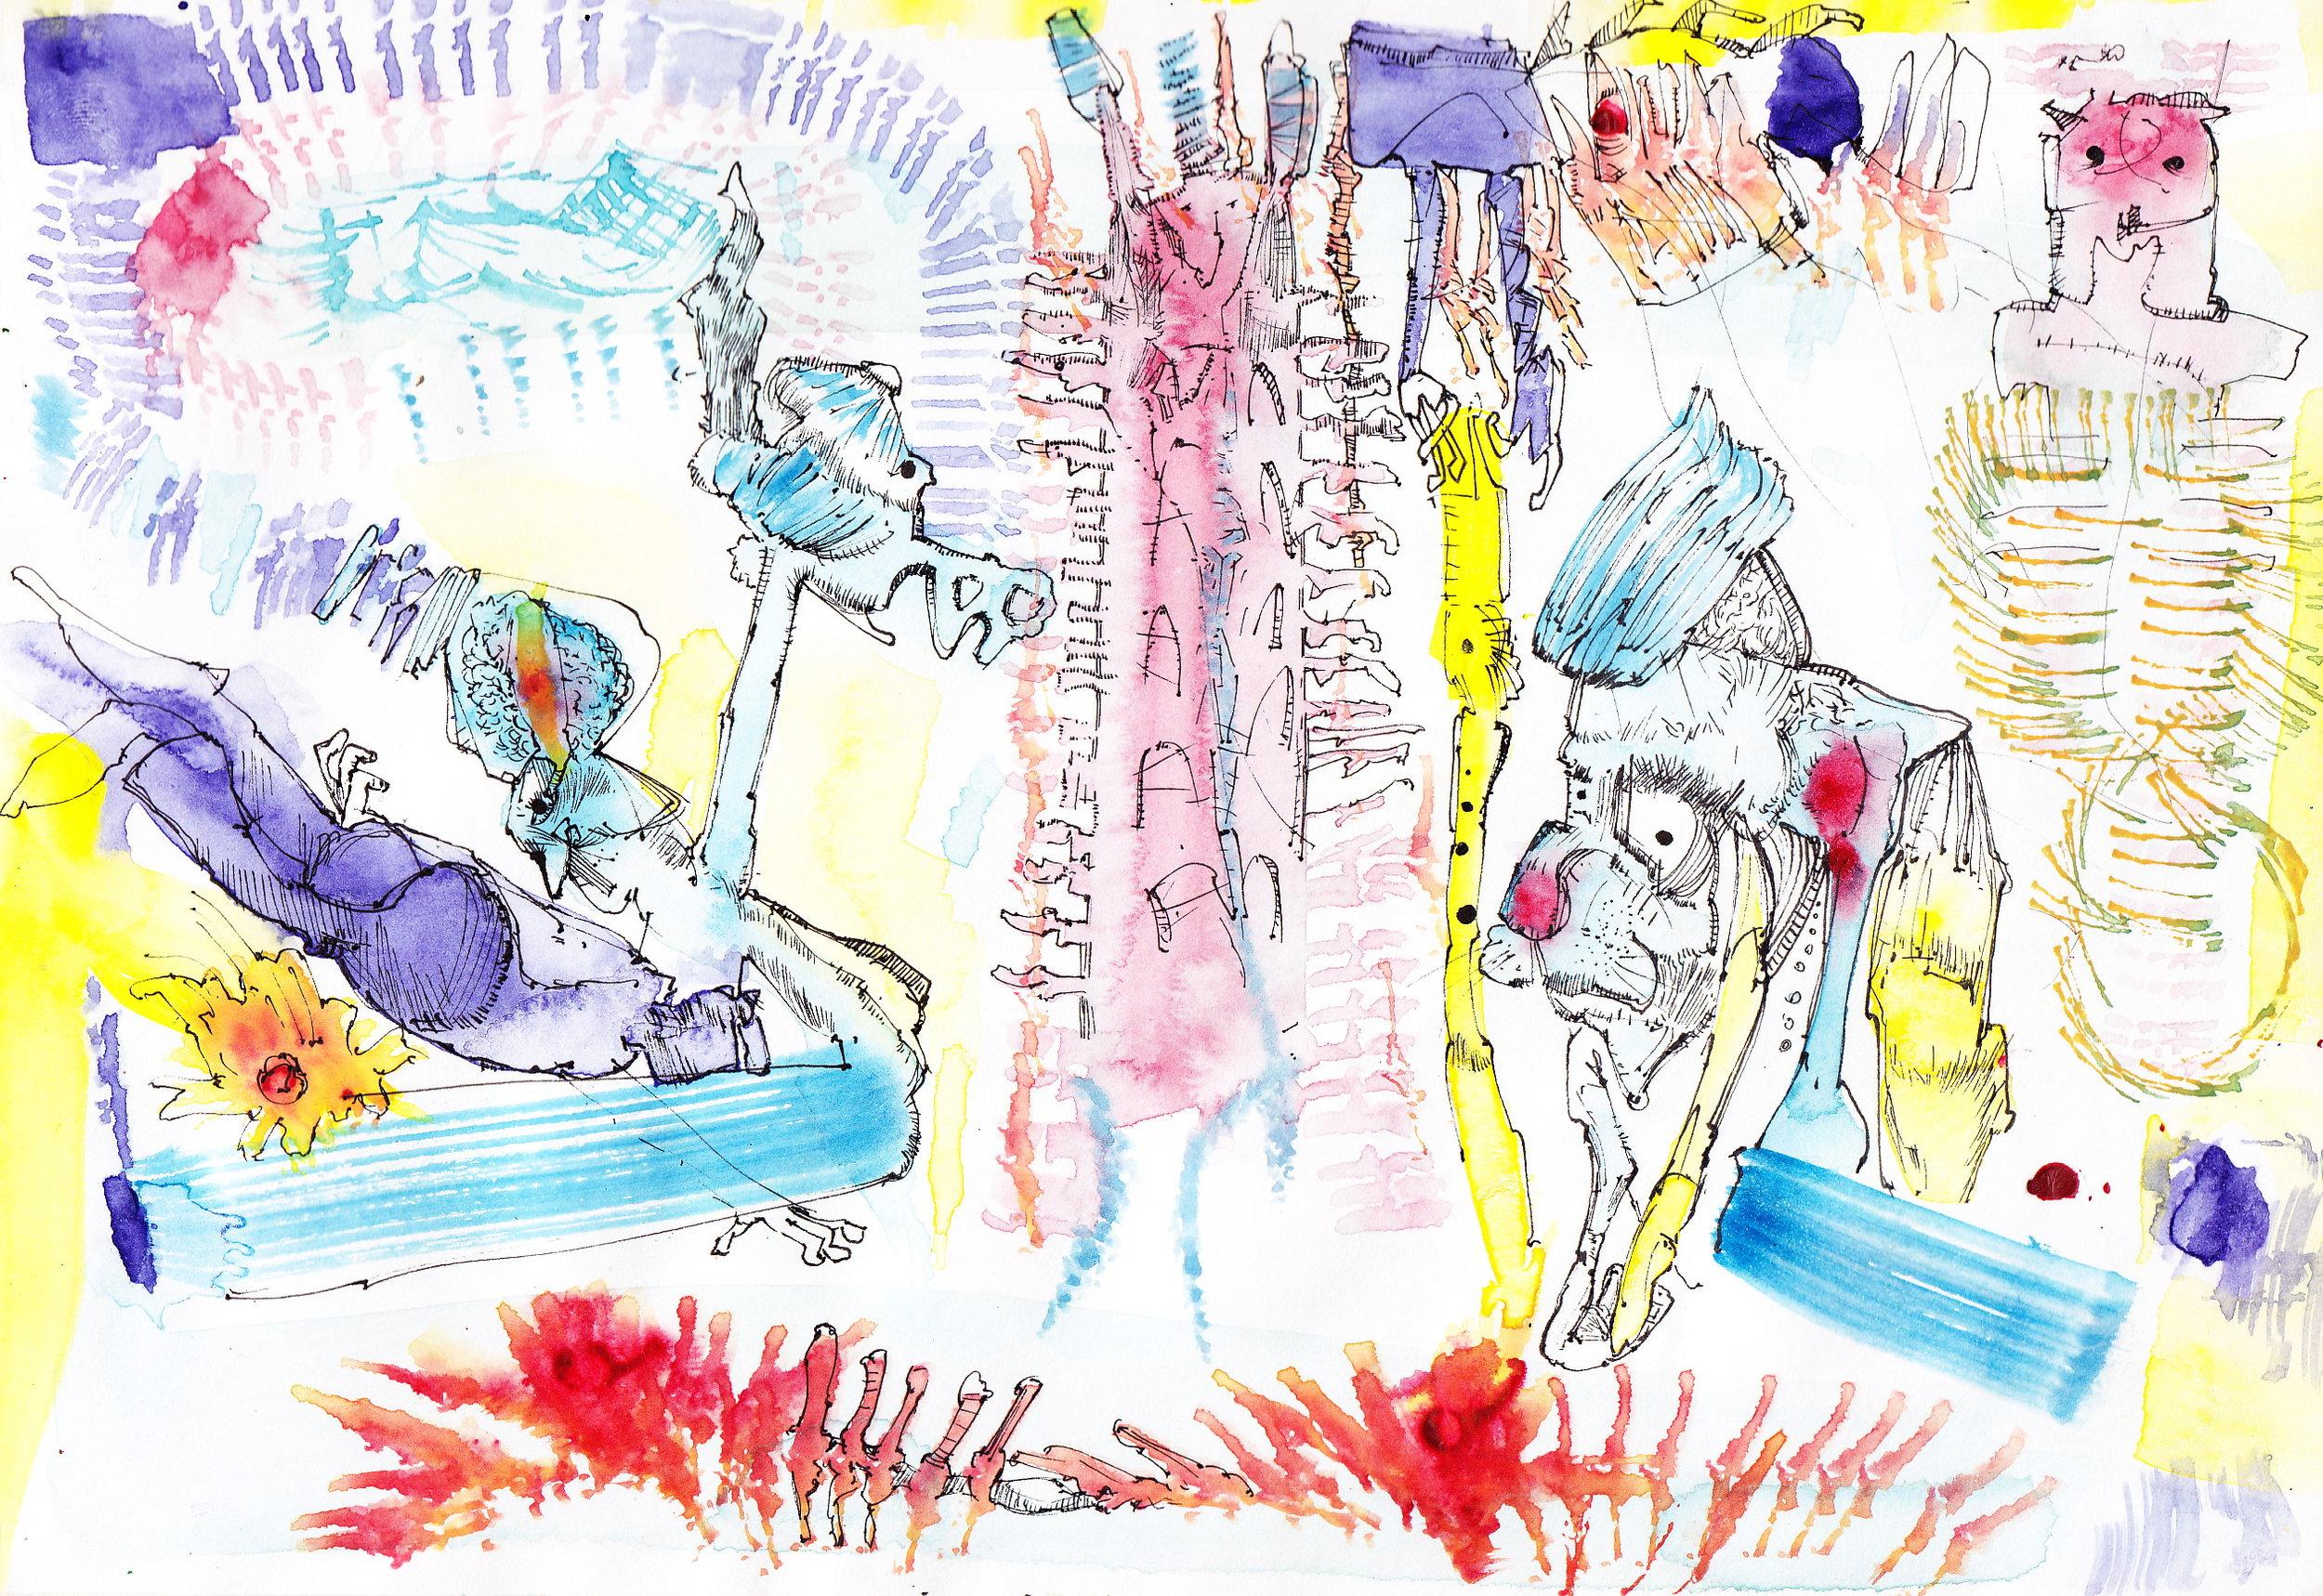 TheBook_001_0035.jpg